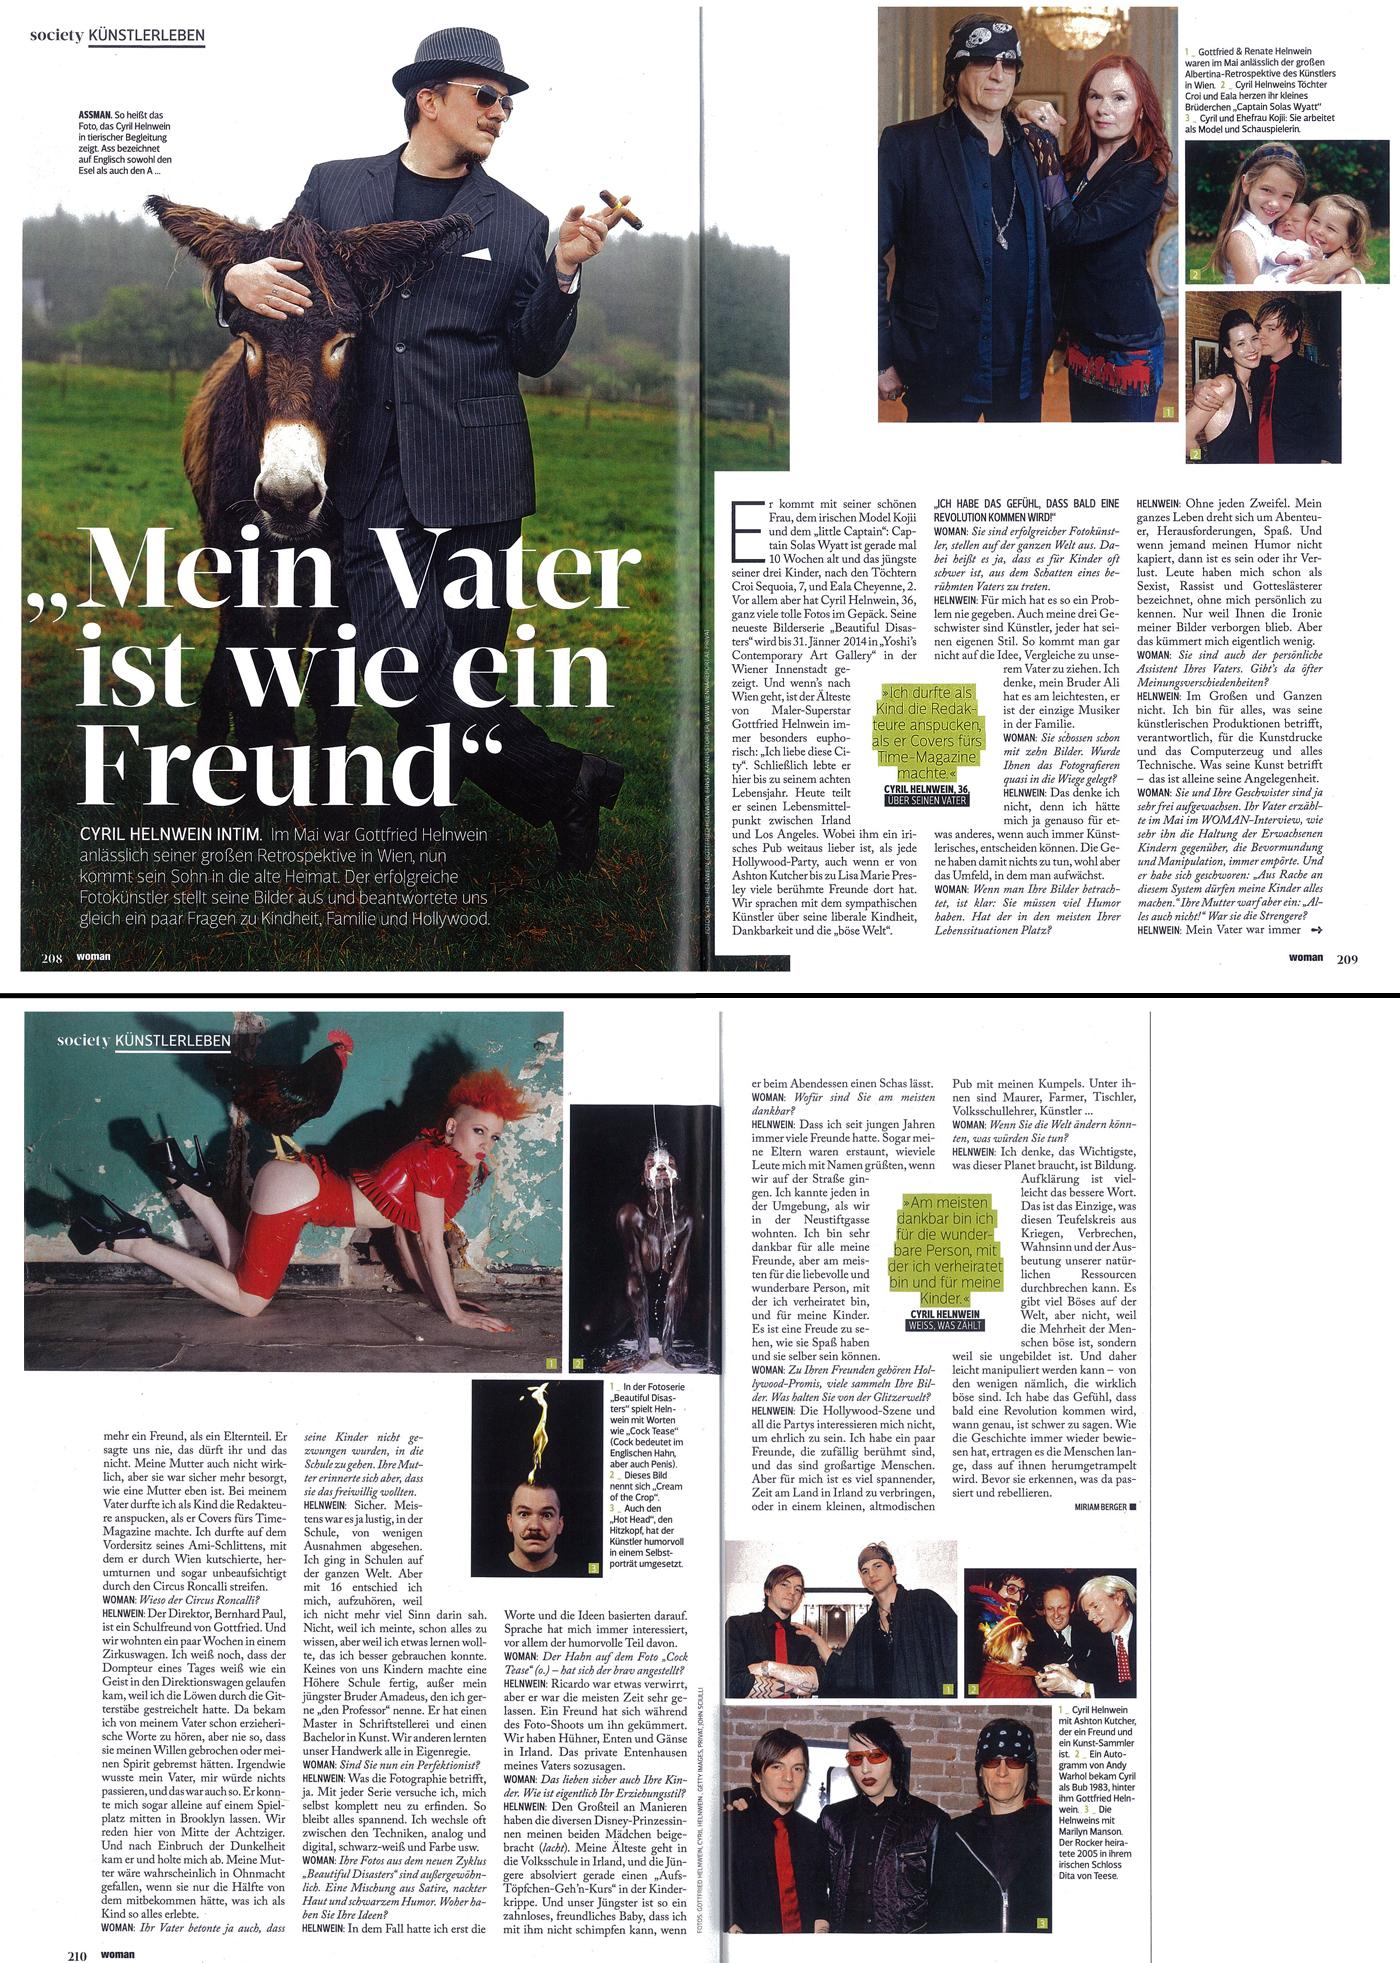 Cyril Helnwein WOMAN Magazin (Austria)